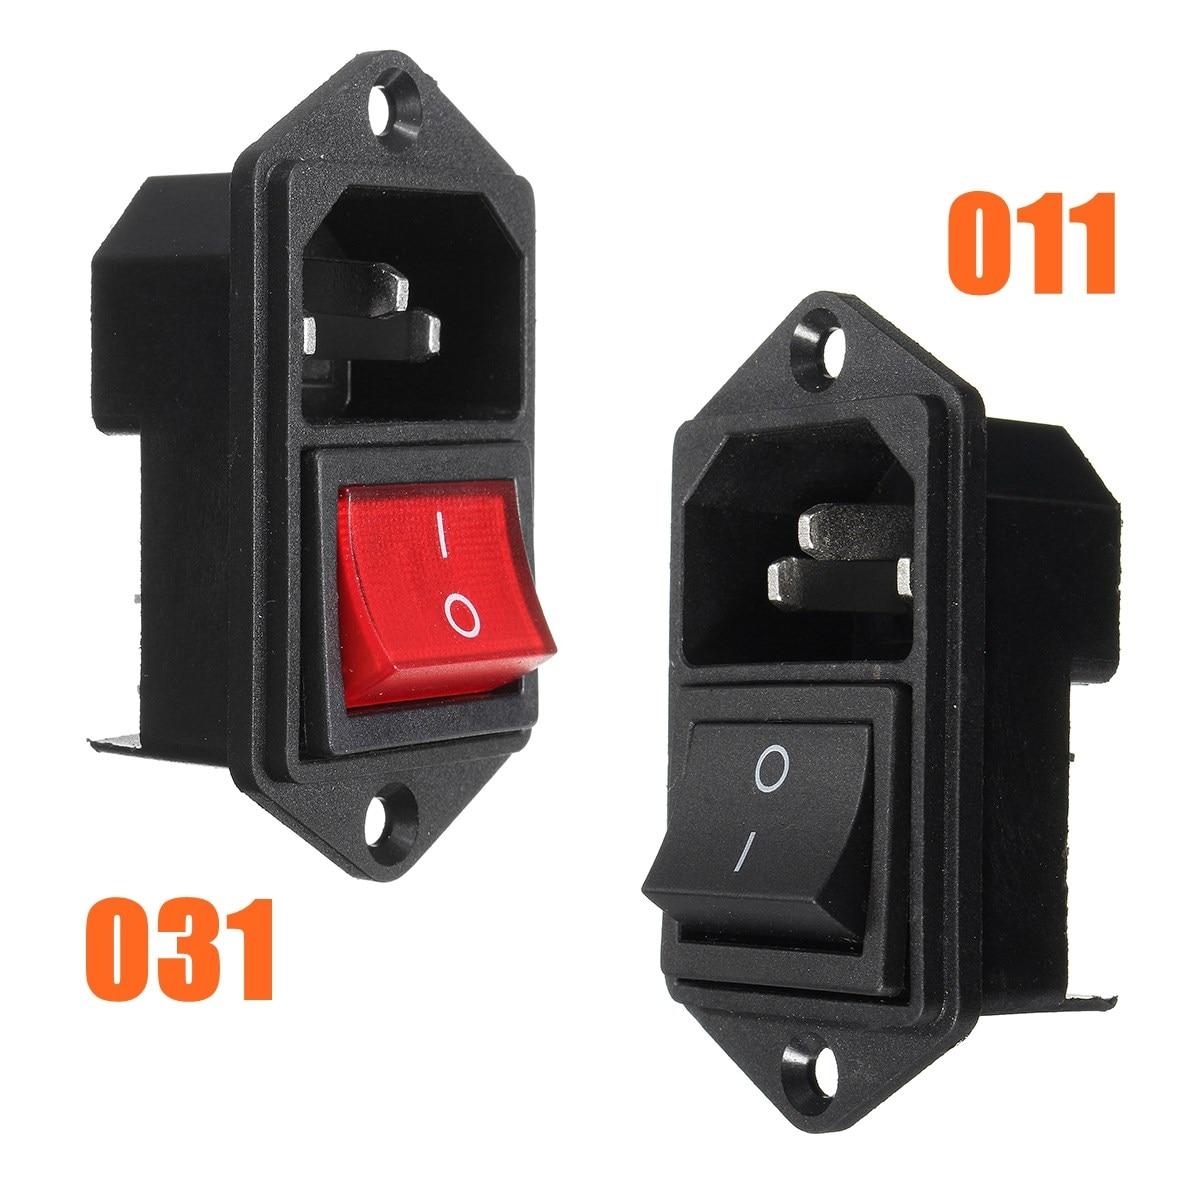 3 Pin IEC320 C14 Inlet Module Plug Fuse w/ Switch Male Power Socket 10A 250V Black/Red 10A 250V AC